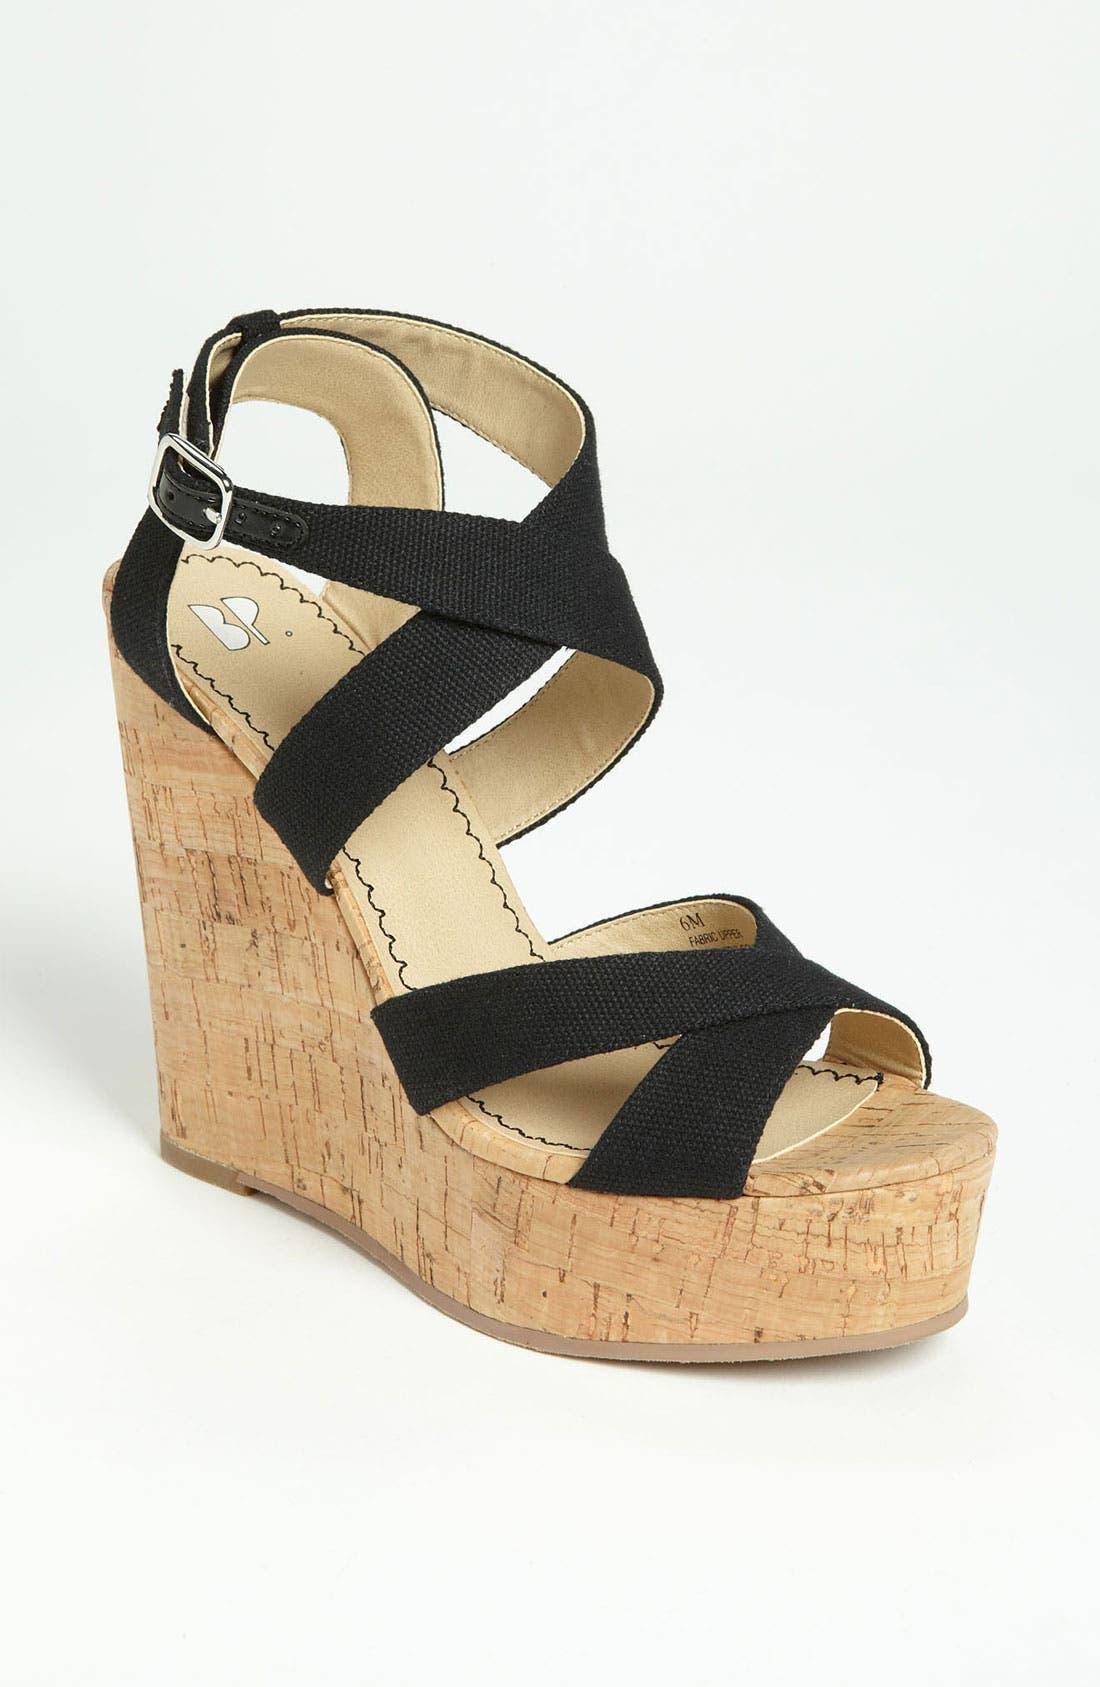 Alternate Image 1 Selected - BP. 'Erika' Wedge Sandal